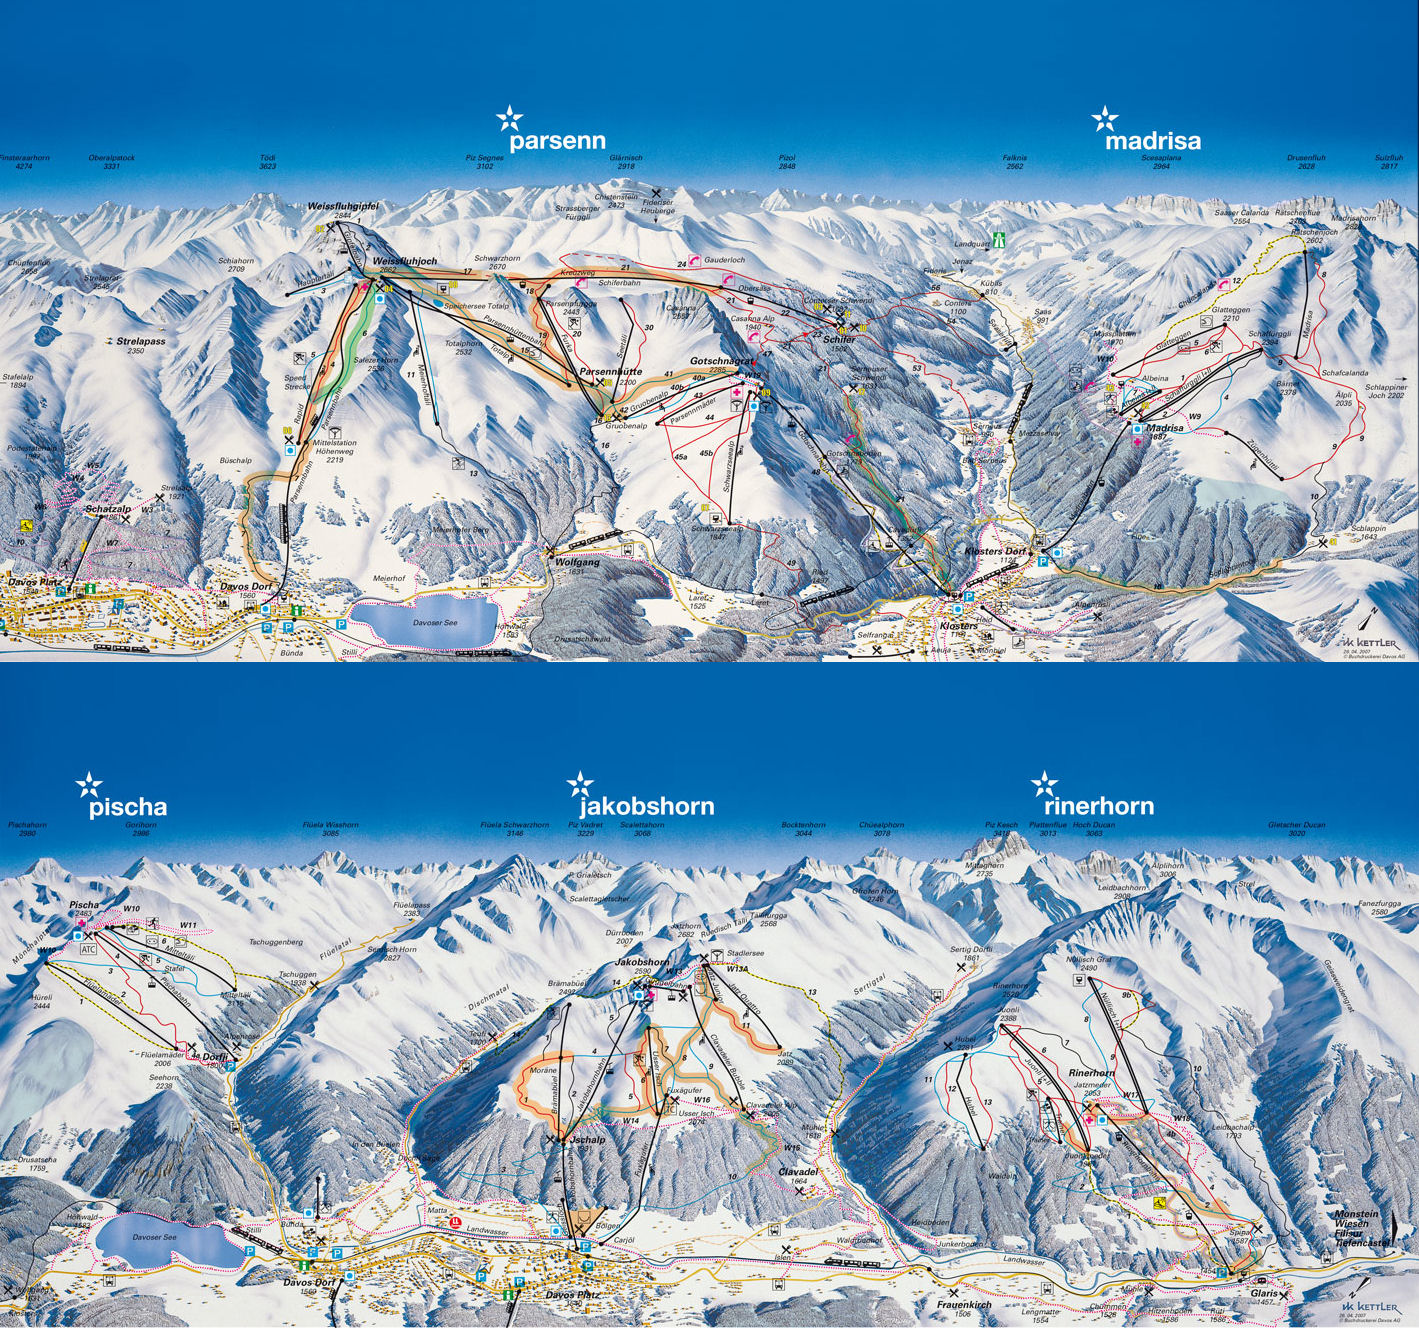 Ski Davos by train - take the railway to ski or snowboard in Graubünden